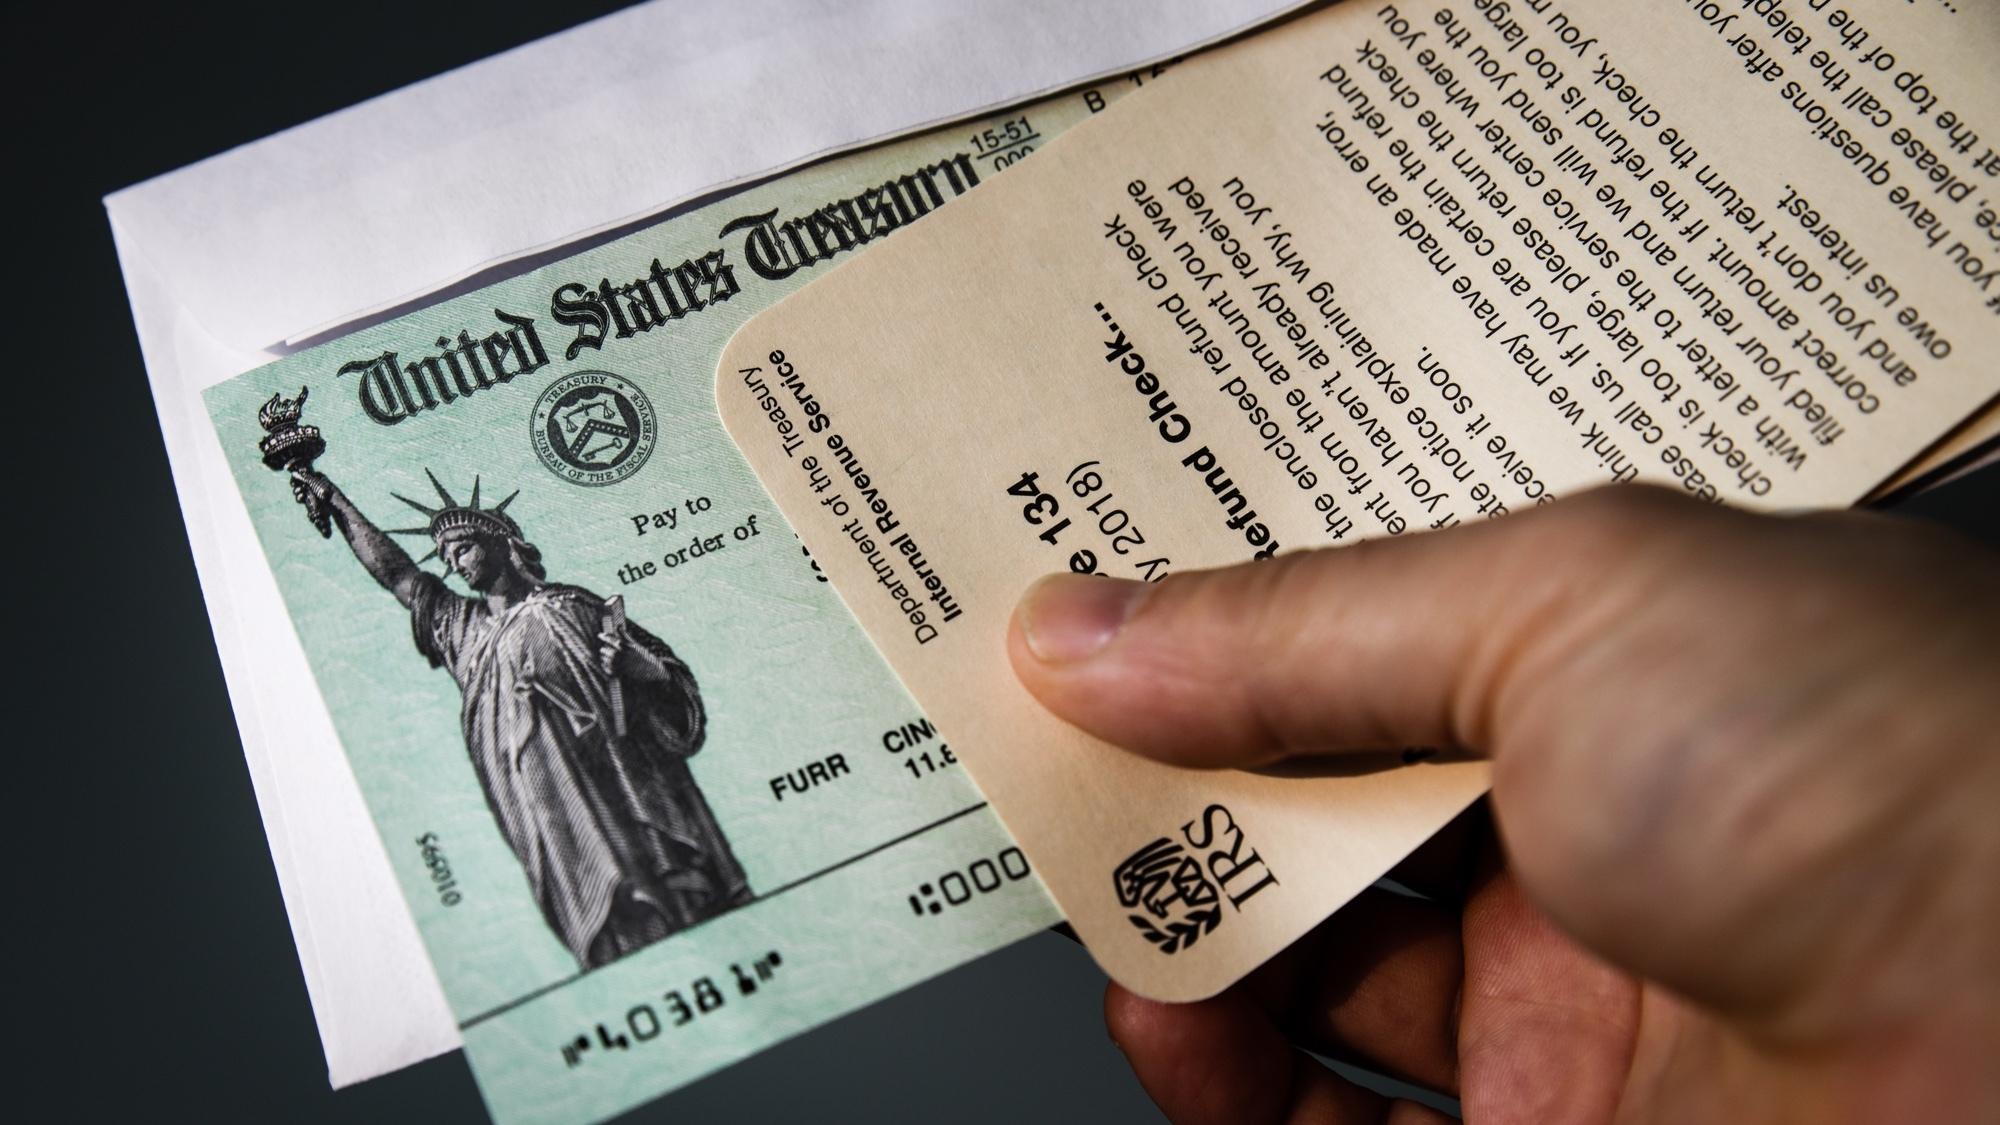 Stimulus Check 2021 Government Website - LUSTIMU